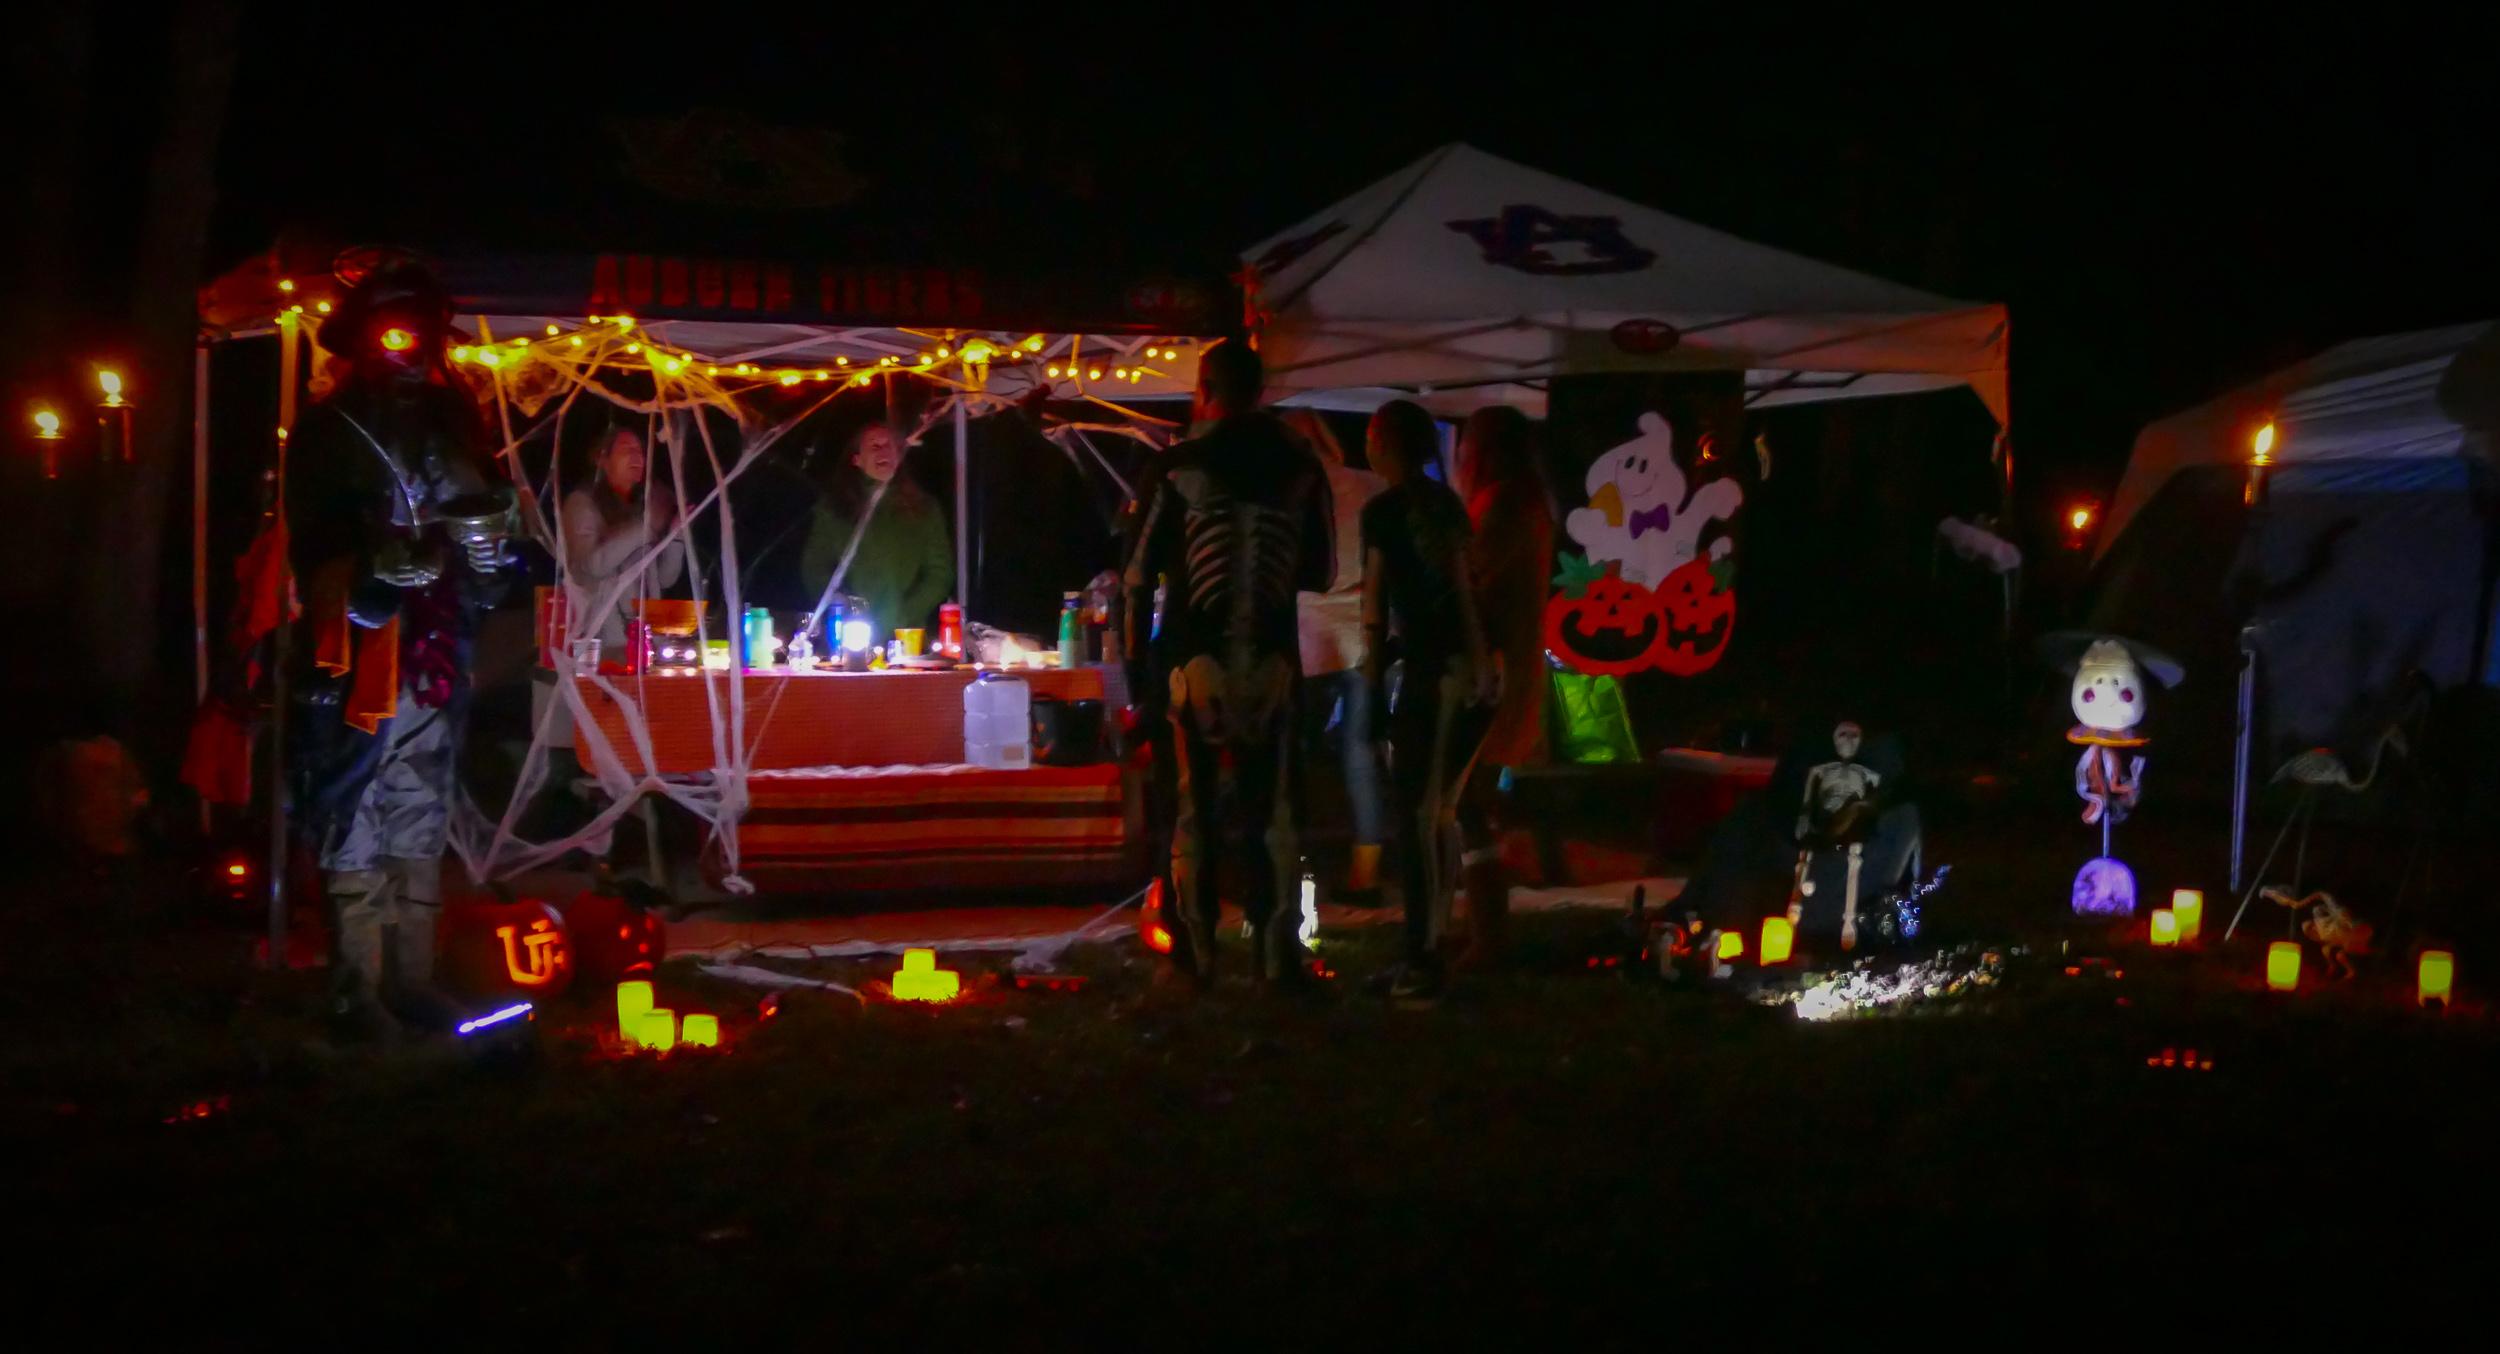 20181027_Marina_Halloween_Evening_1193-2.jpg